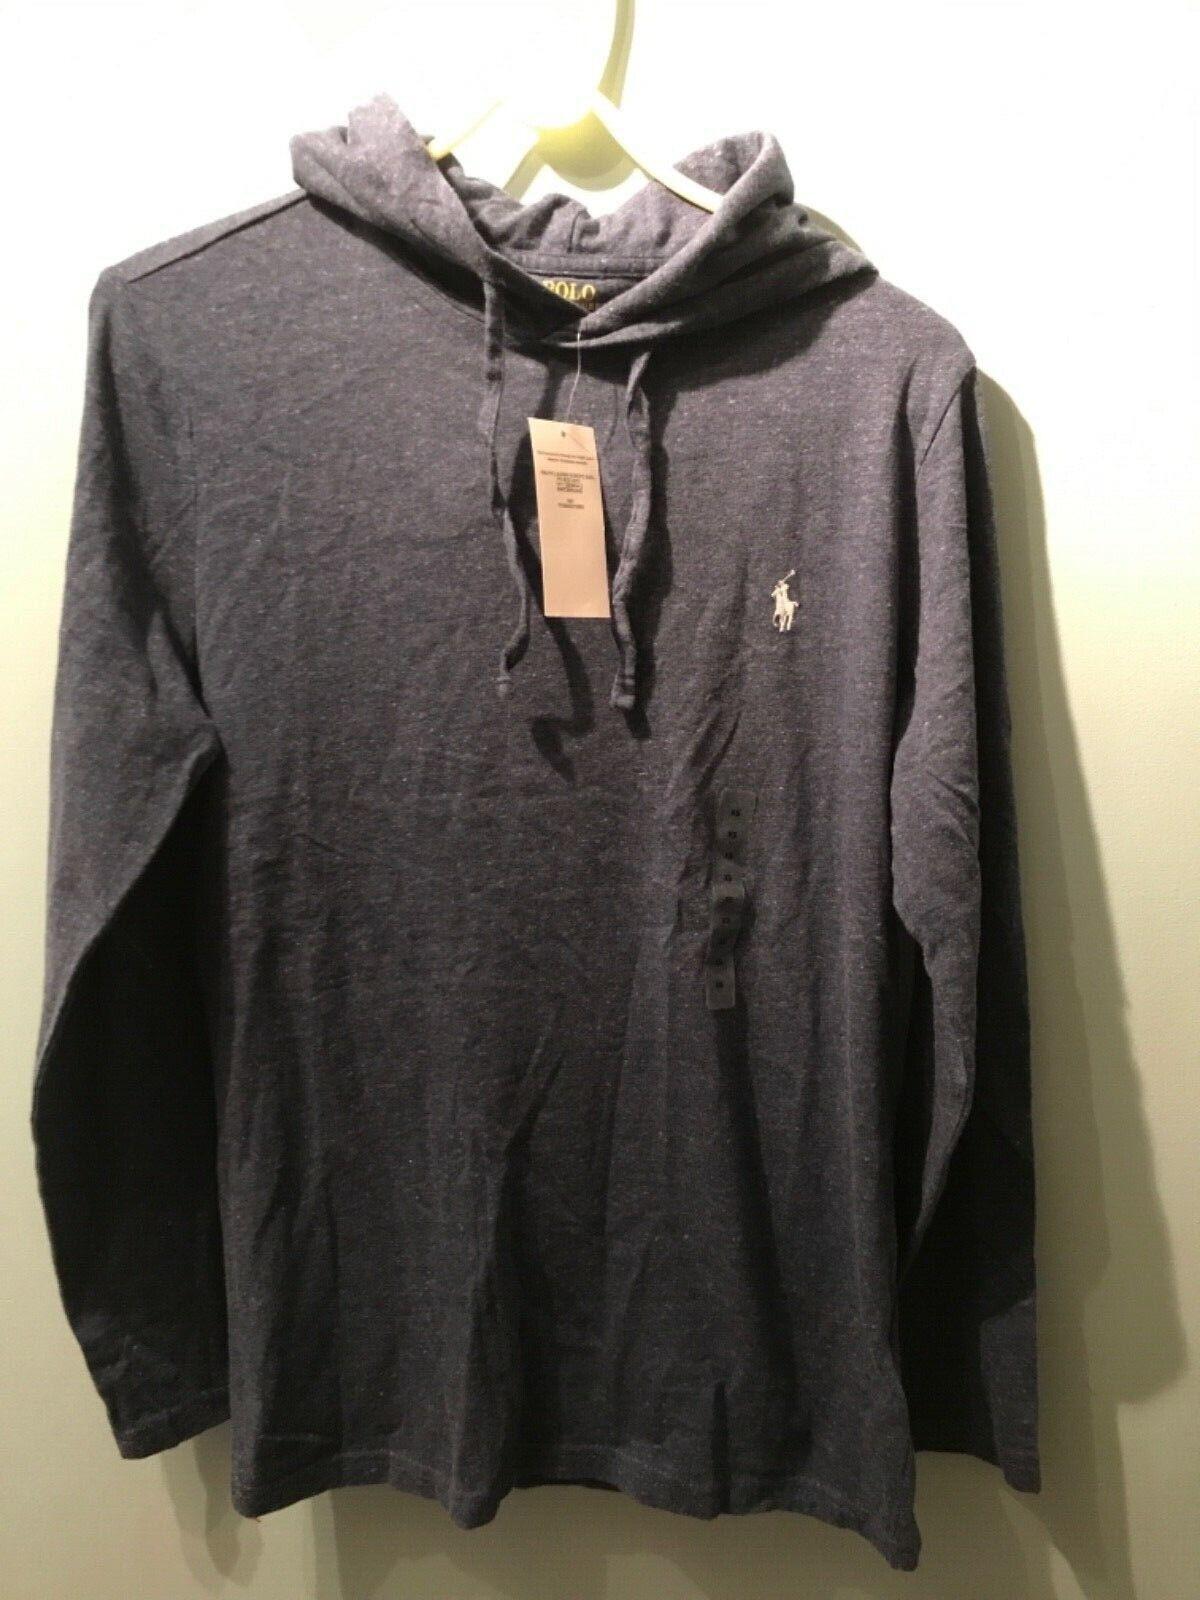 BNWT Ralph Lauren Men's Hooded Top Jumper Sweater Top RRP  Sz XS Extra Small